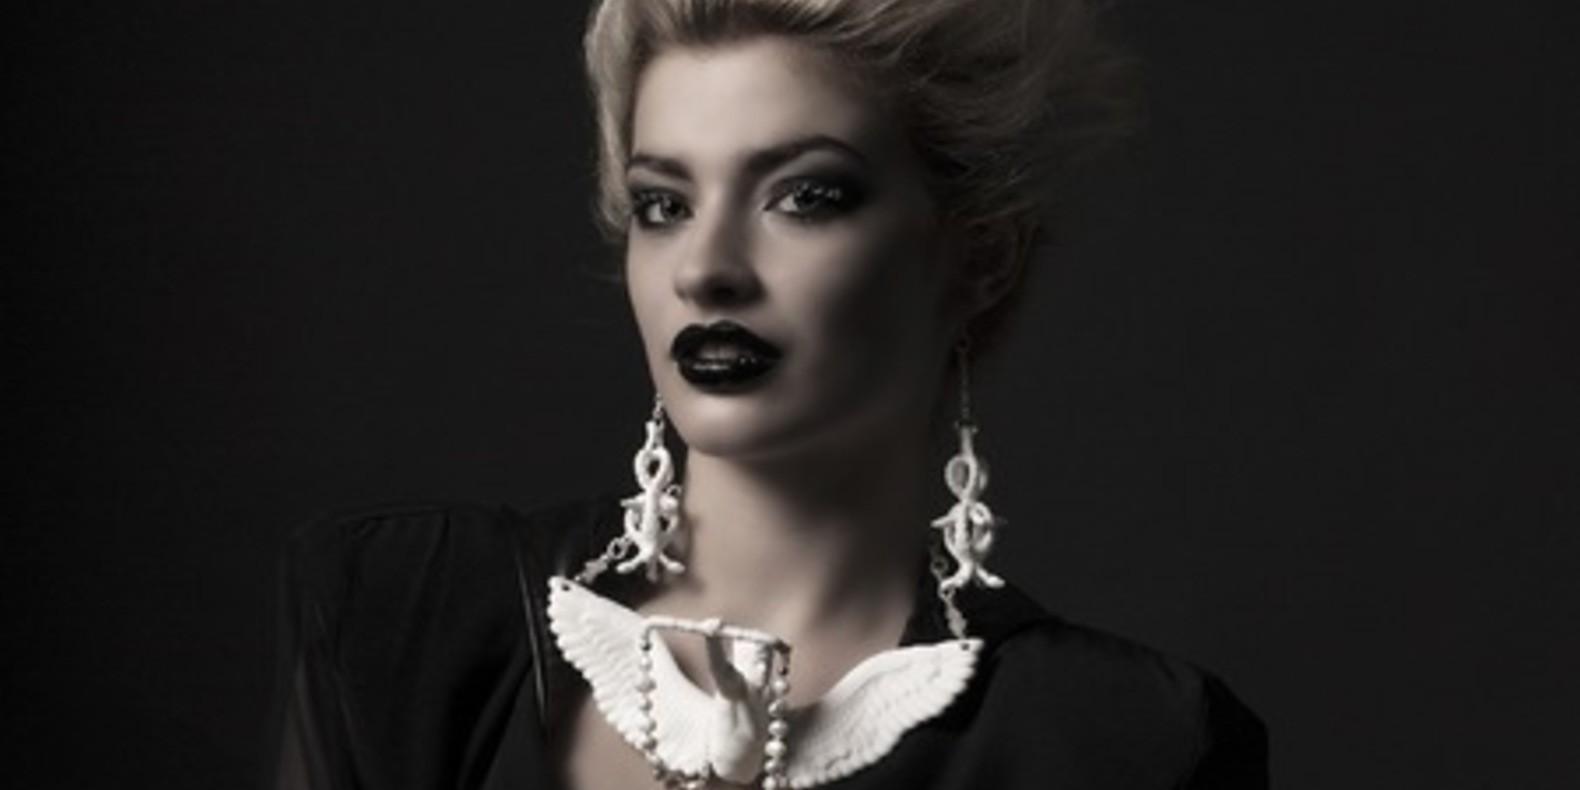 rob elfort 3D printing impression 3D jewlery bijoux vêtements cults cults 3D fichier 3D 6